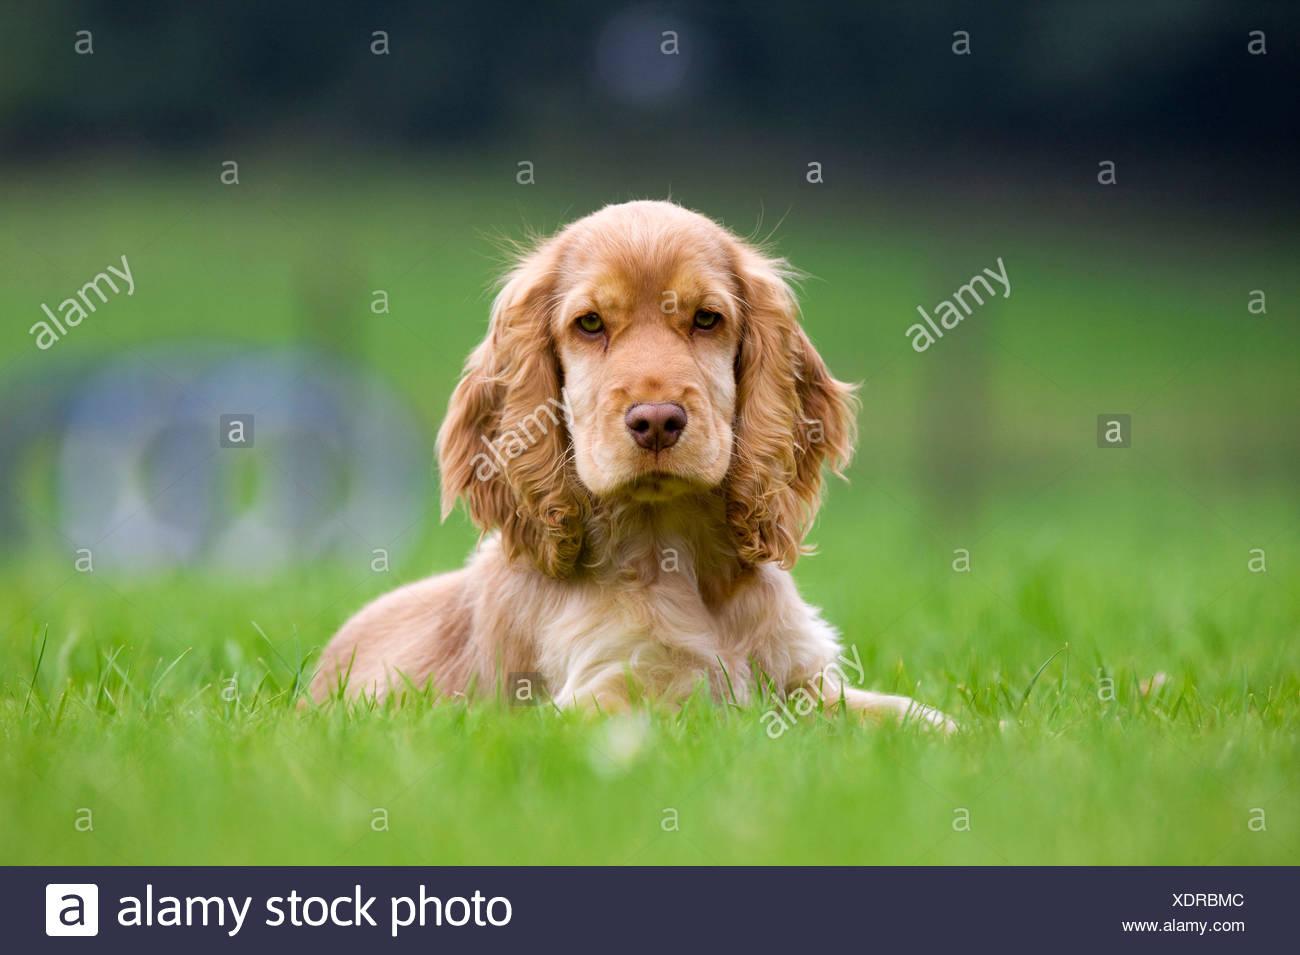 English Cocker Spaniel - Stock Image